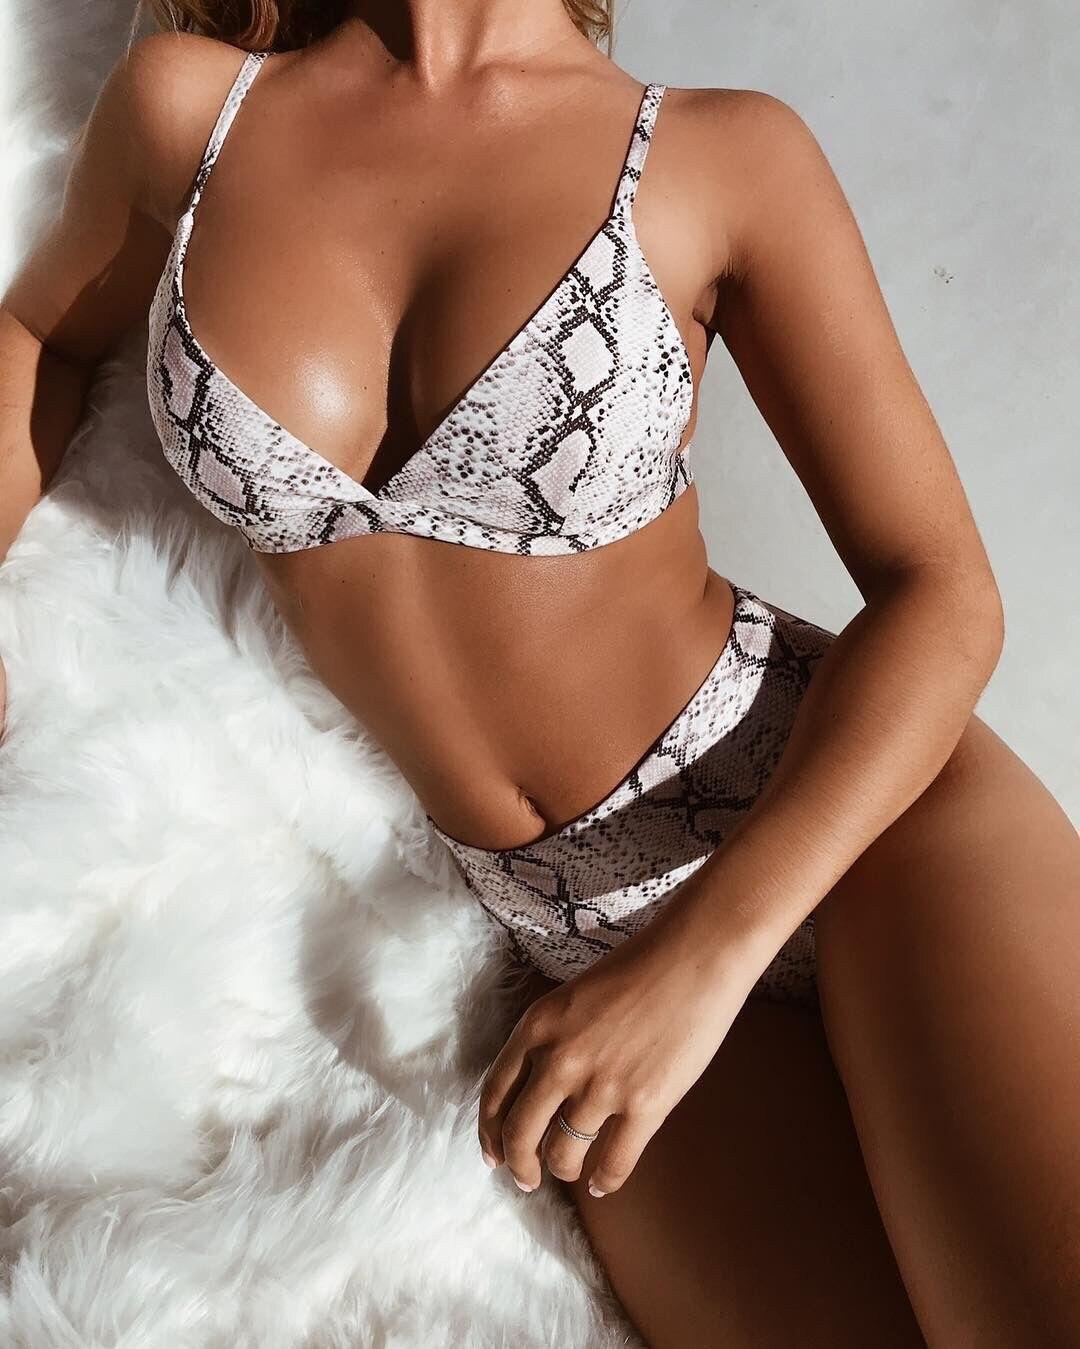 bikinis swimming suit for women bikini 2018 dropshipping new 2018 hot selling sexy bathing suits plus size girls fashion summer in Bikinis Set from Sports Entertainment